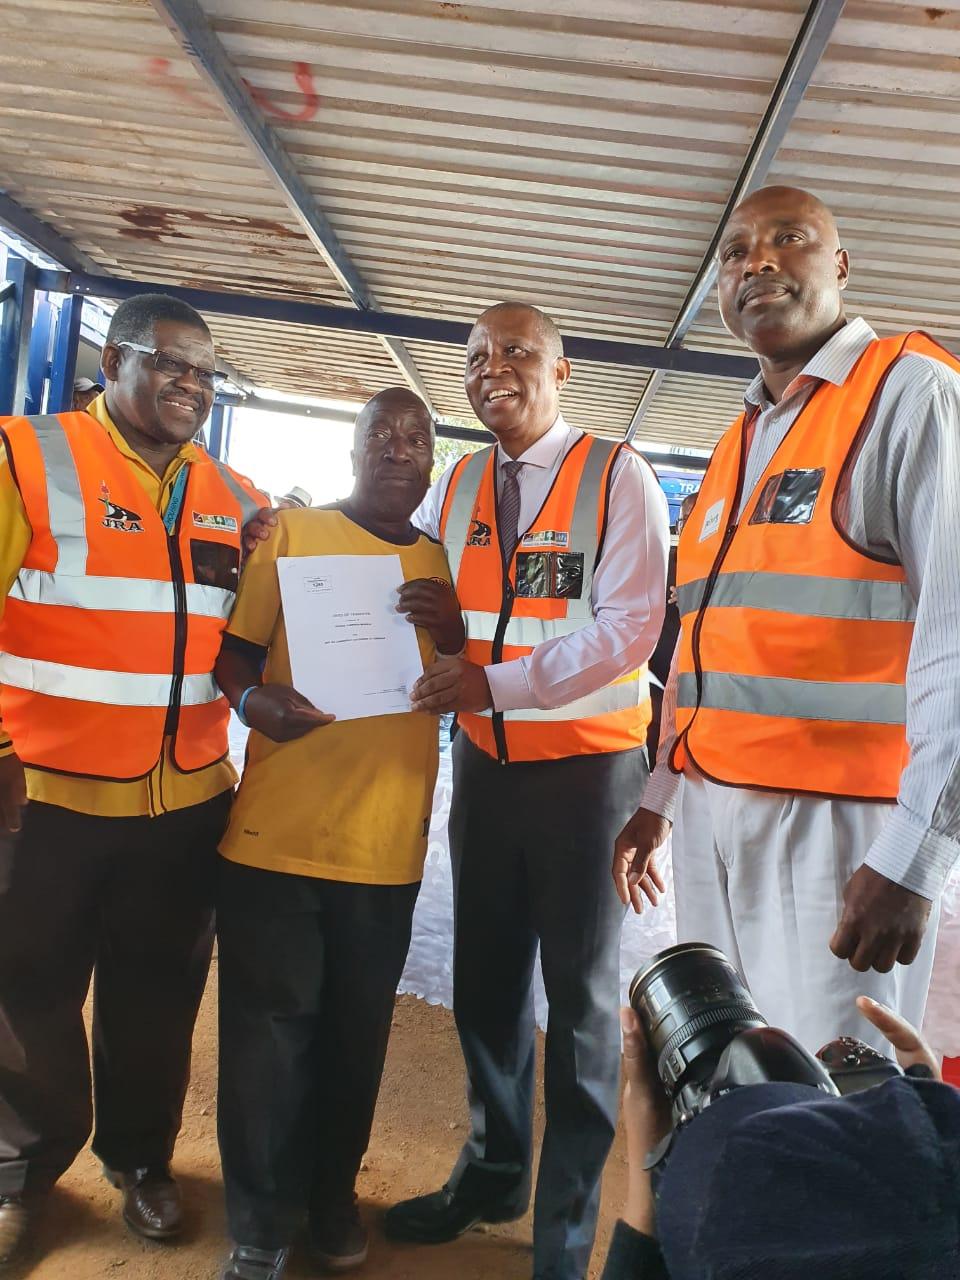 City has now provided over 8000 title deeds under Mayor Mashaba's administration